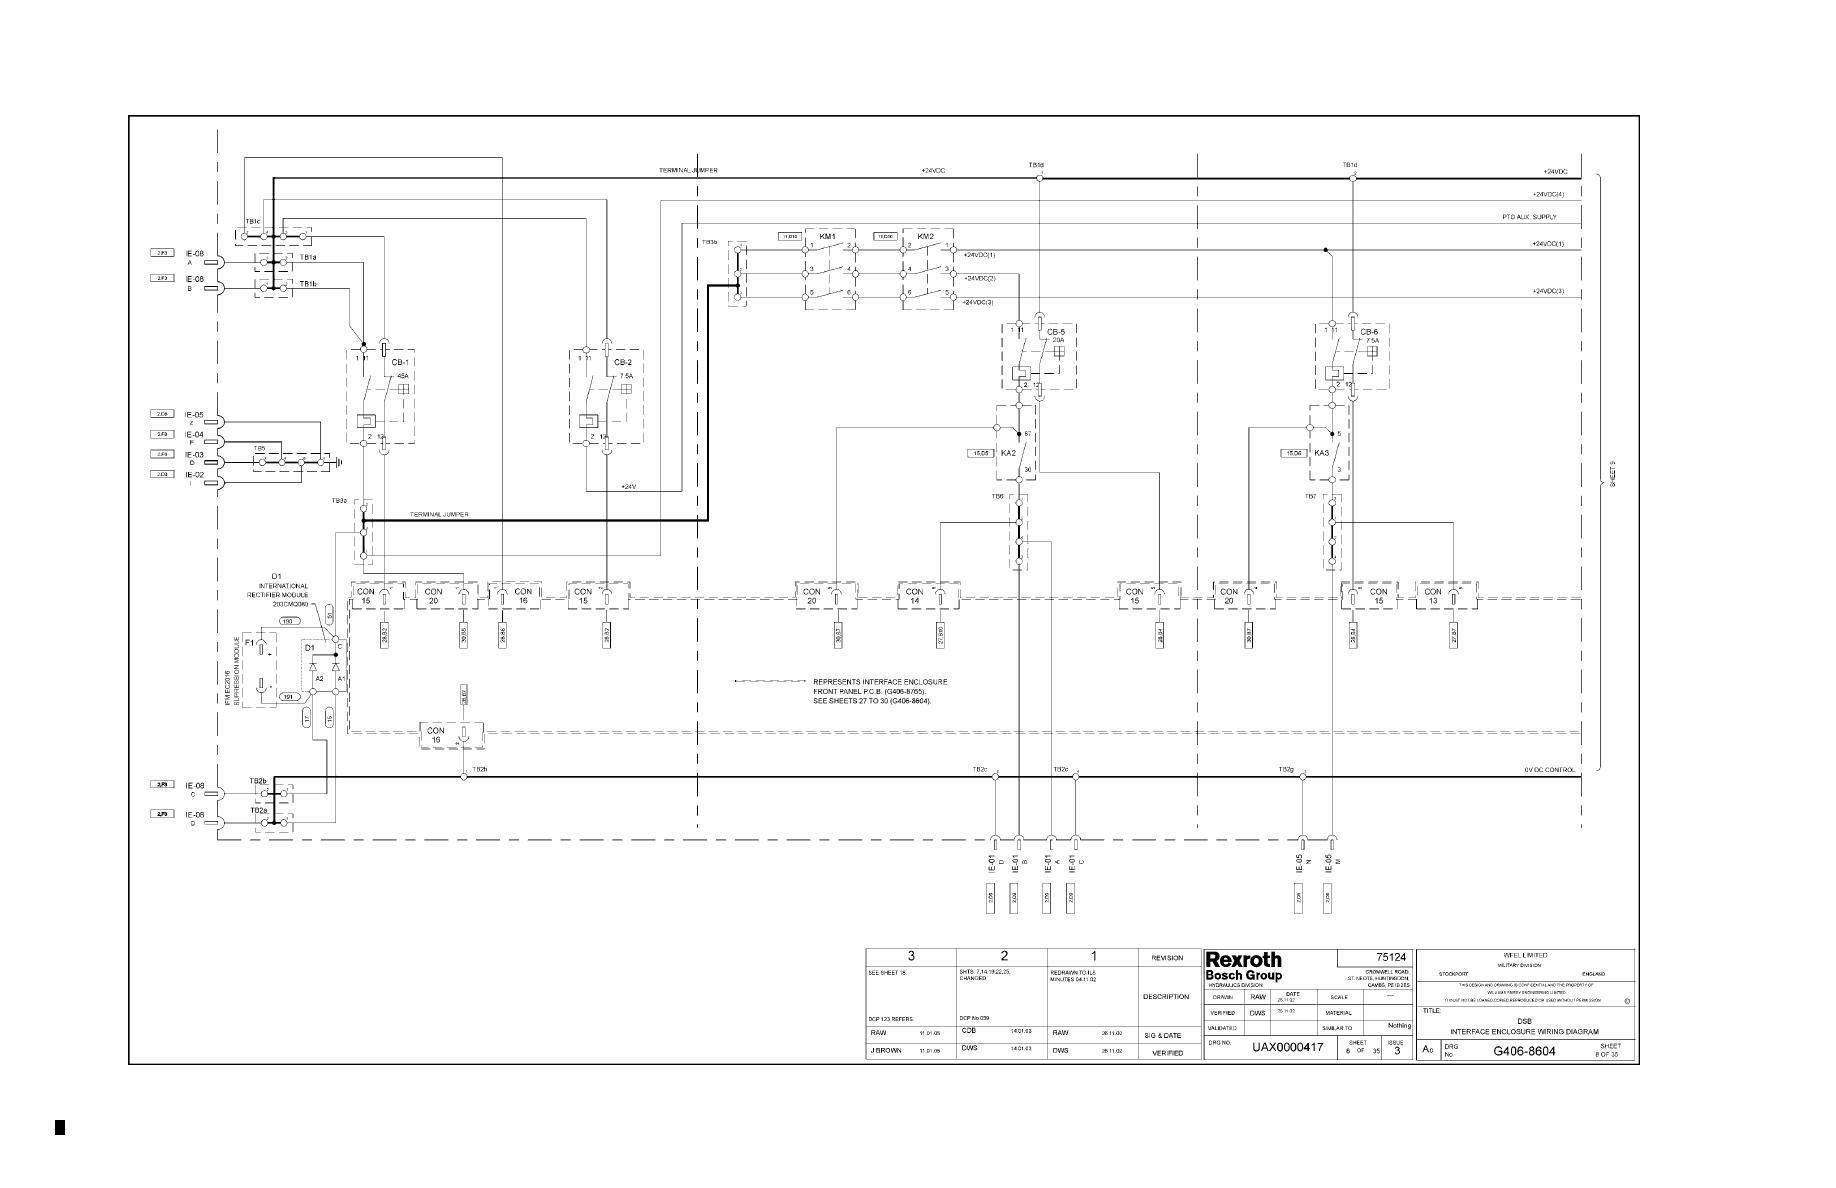 figure 8 interface enclosure wiring diagram. Black Bedroom Furniture Sets. Home Design Ideas